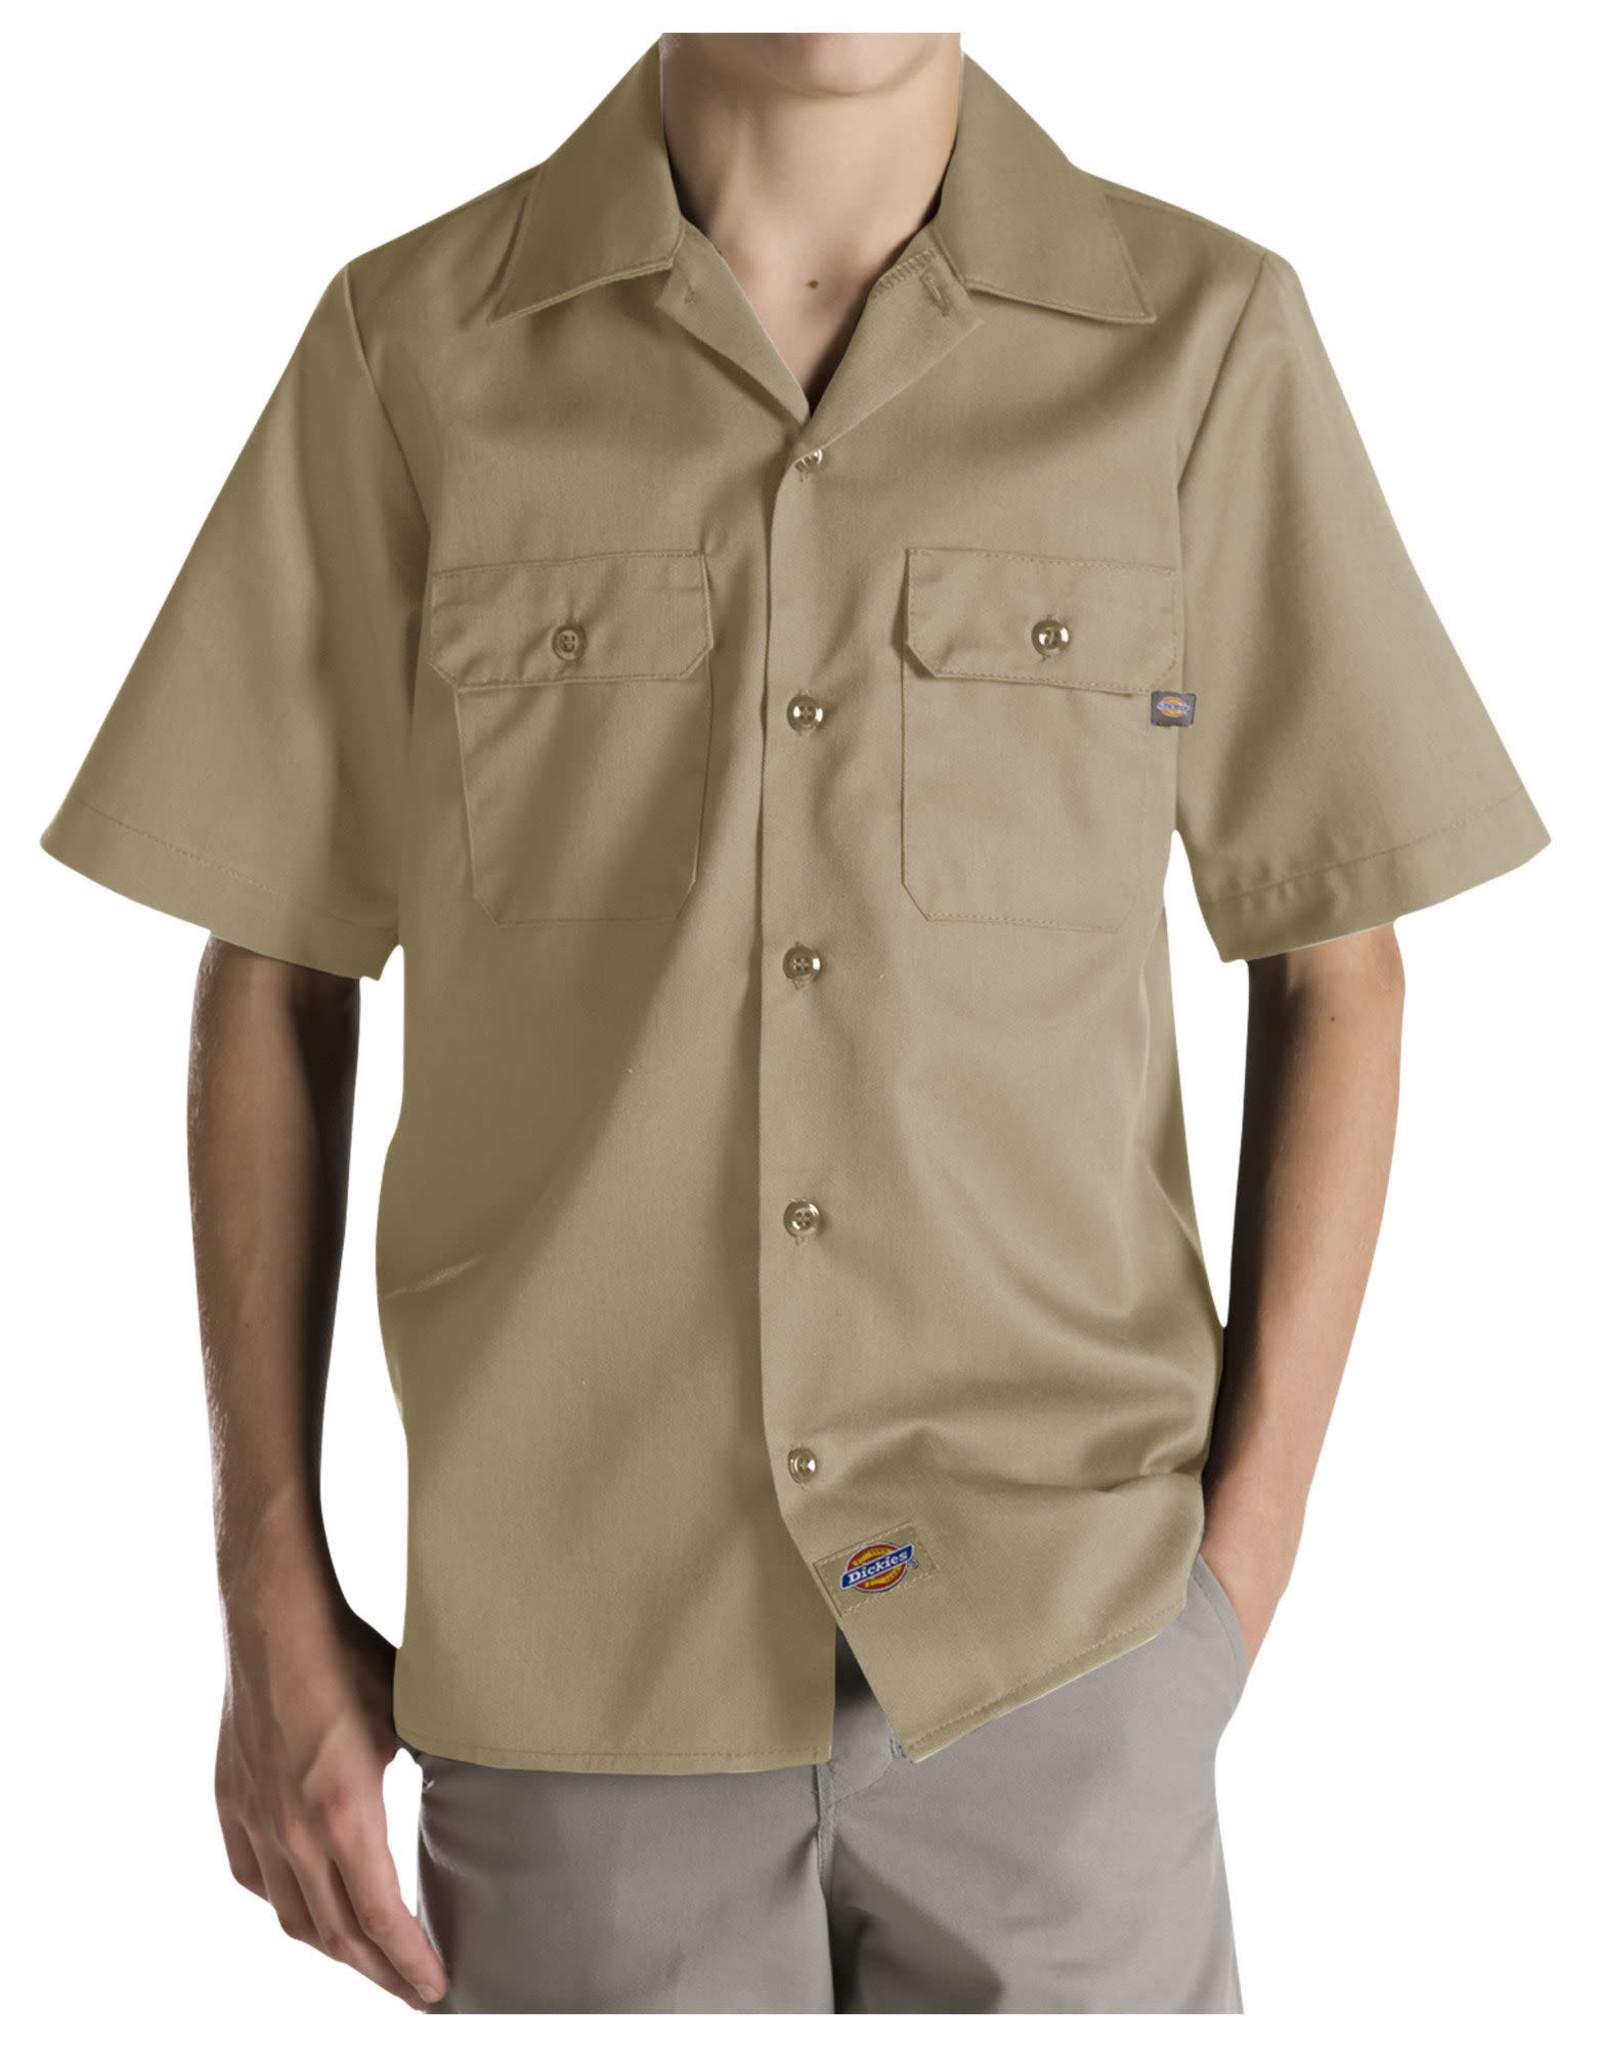 DICKIES Boys' Twill Short Sleeve Shirt QS201